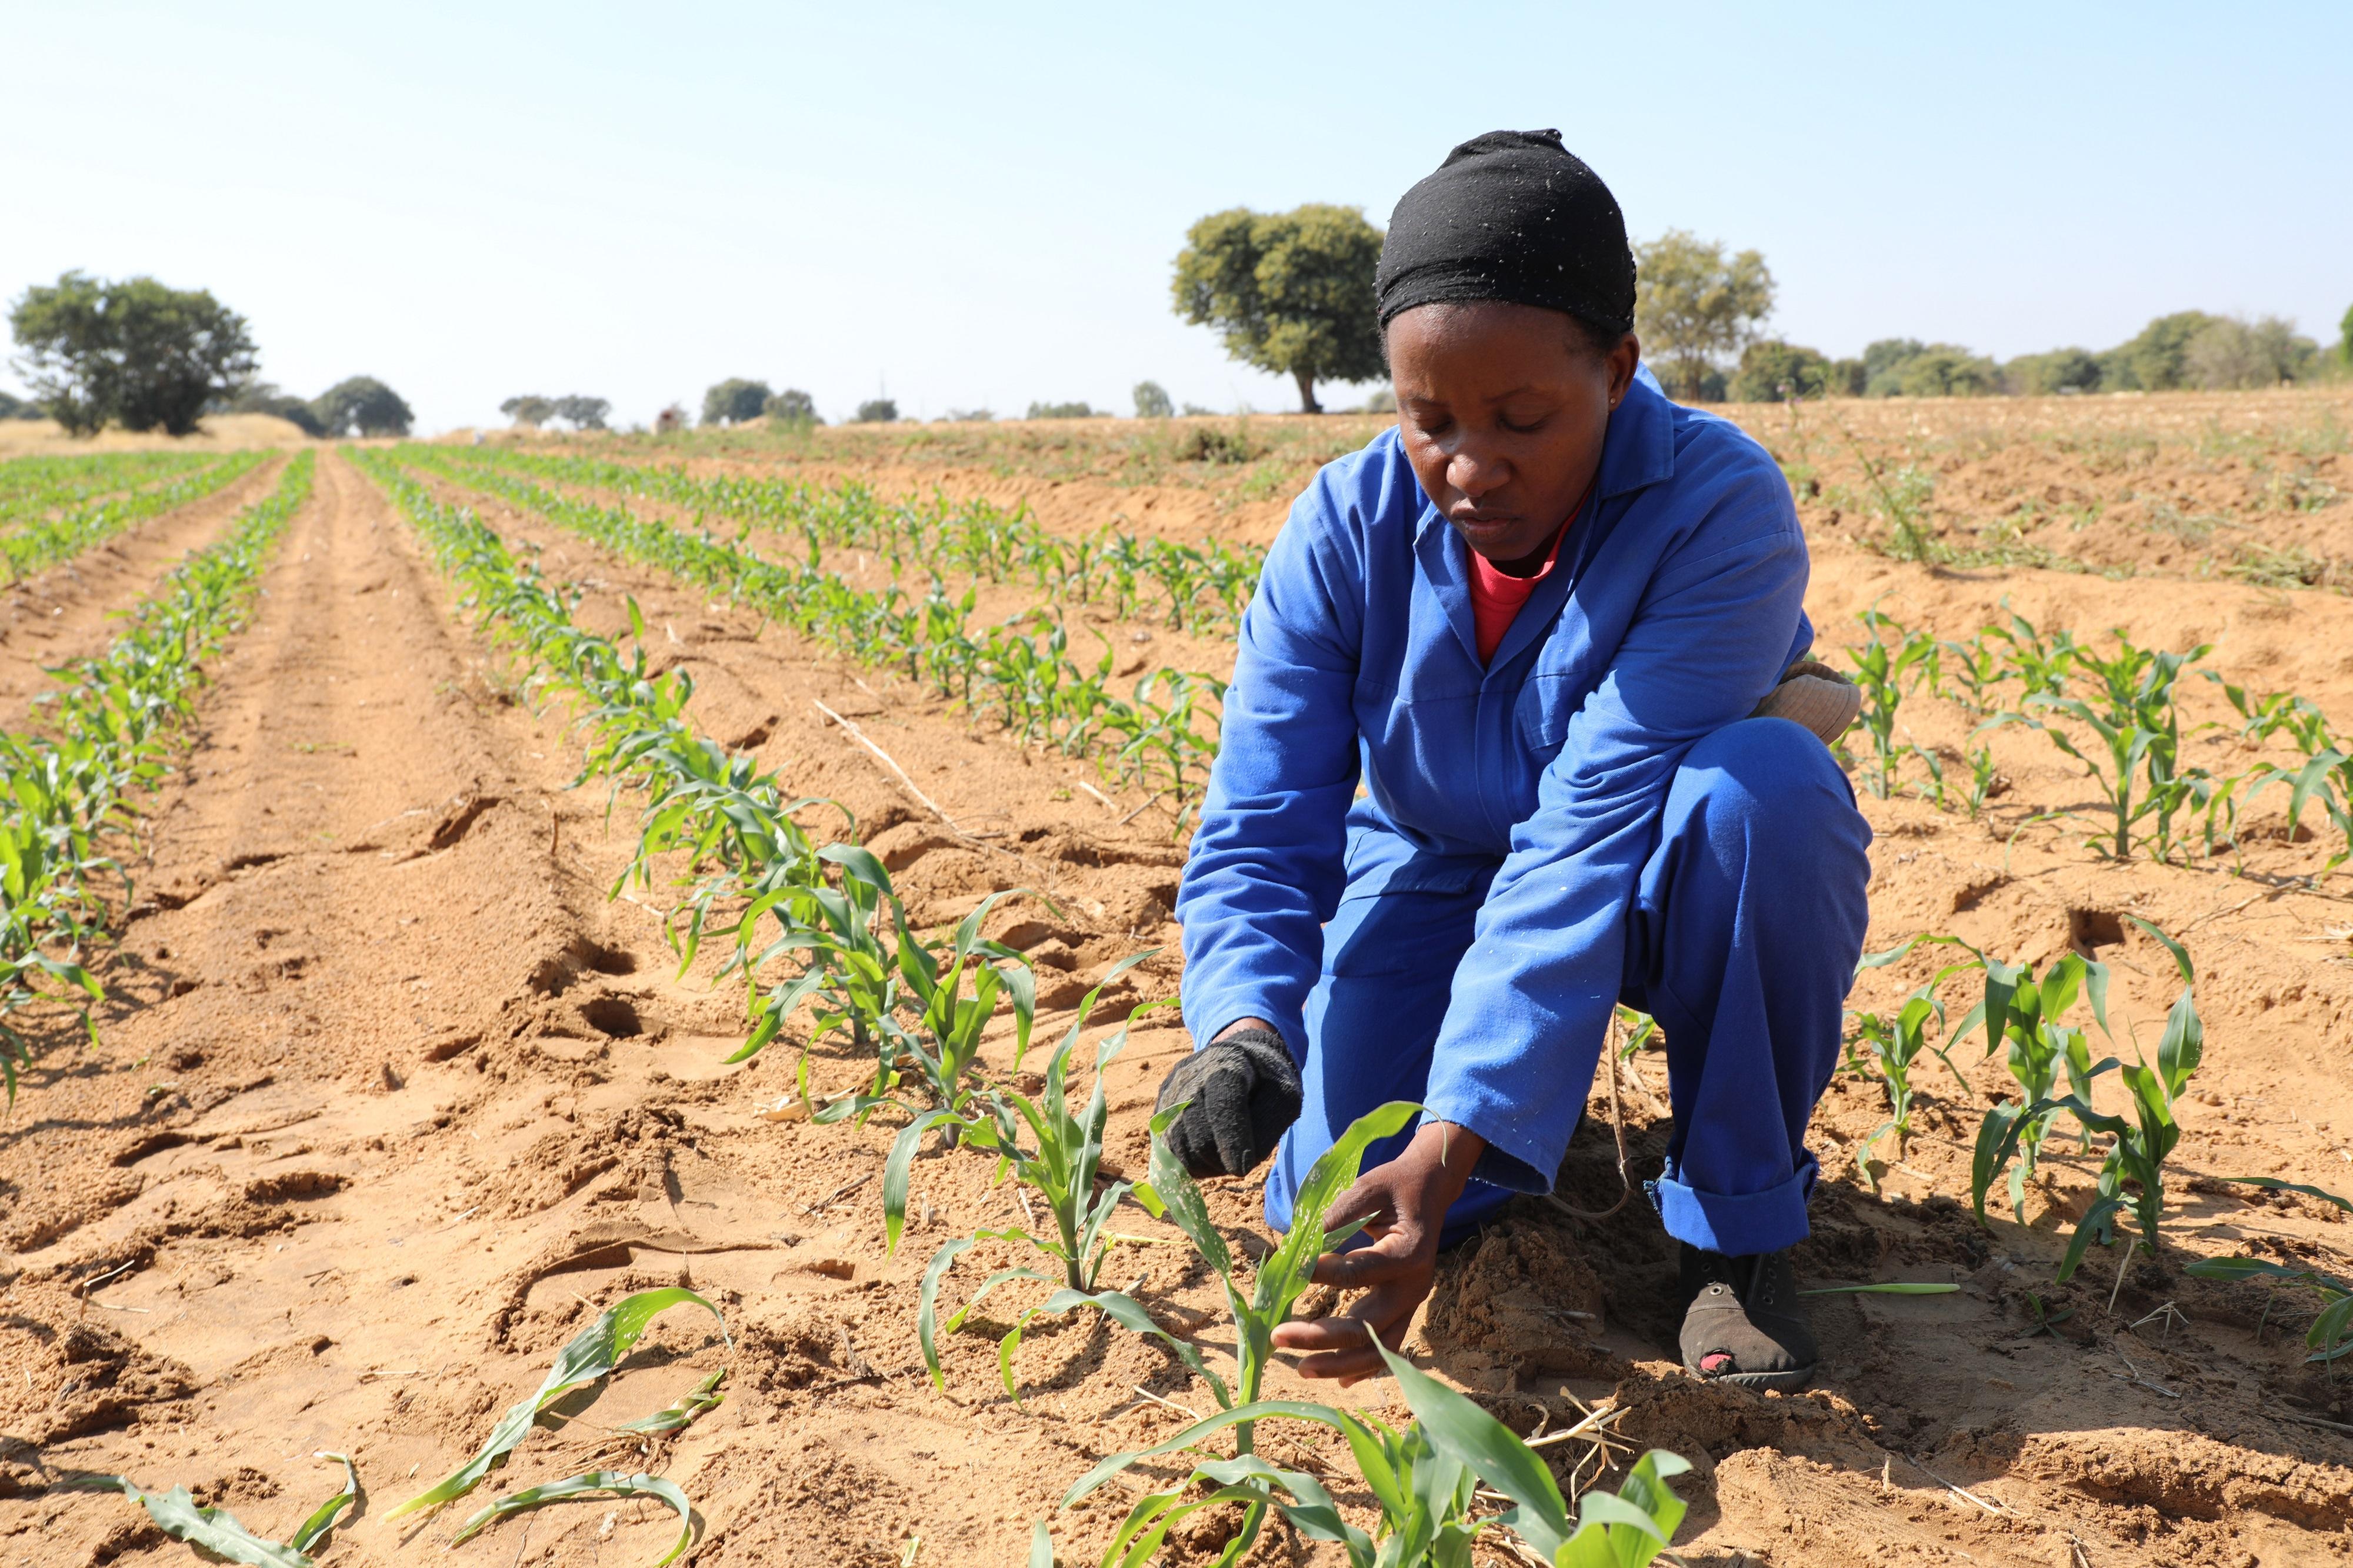 afrique emploi cadre agriculture